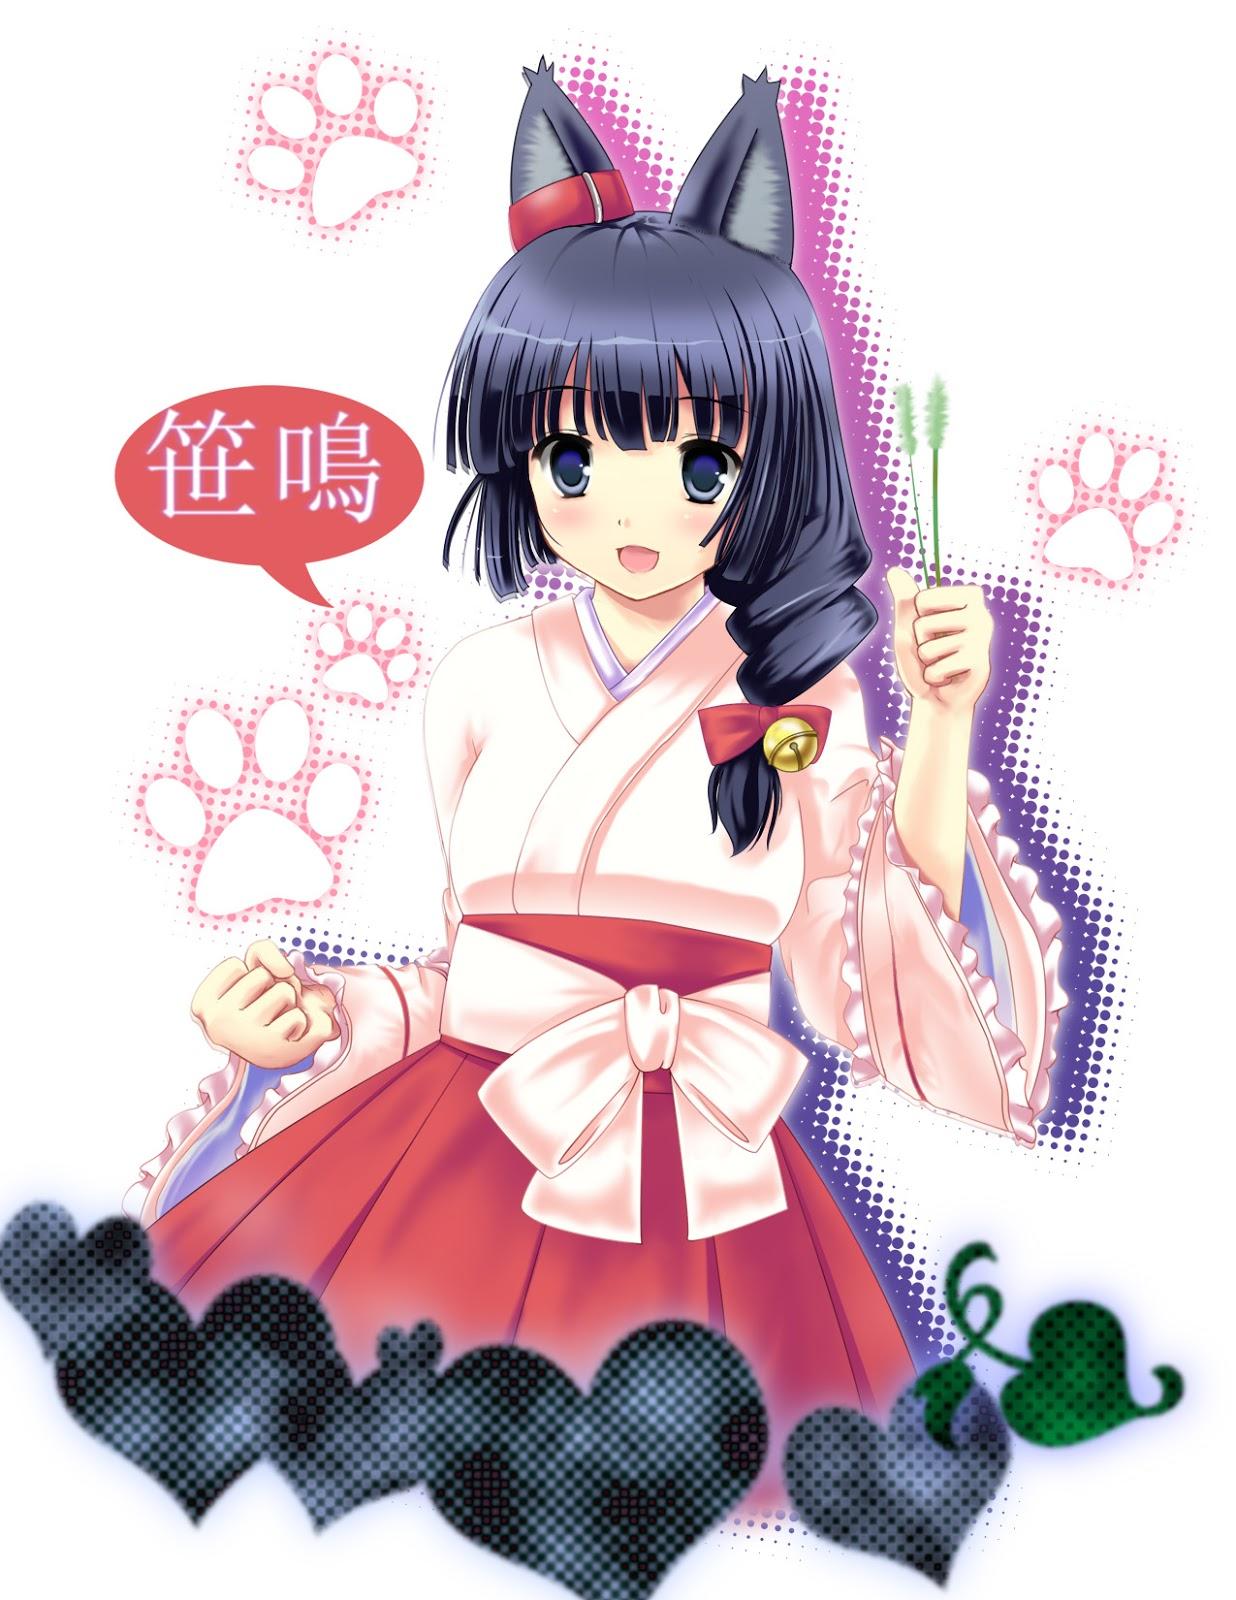 Nekogami Yaoyorozu - Anime Nekogami Yaoyorozu VietSub